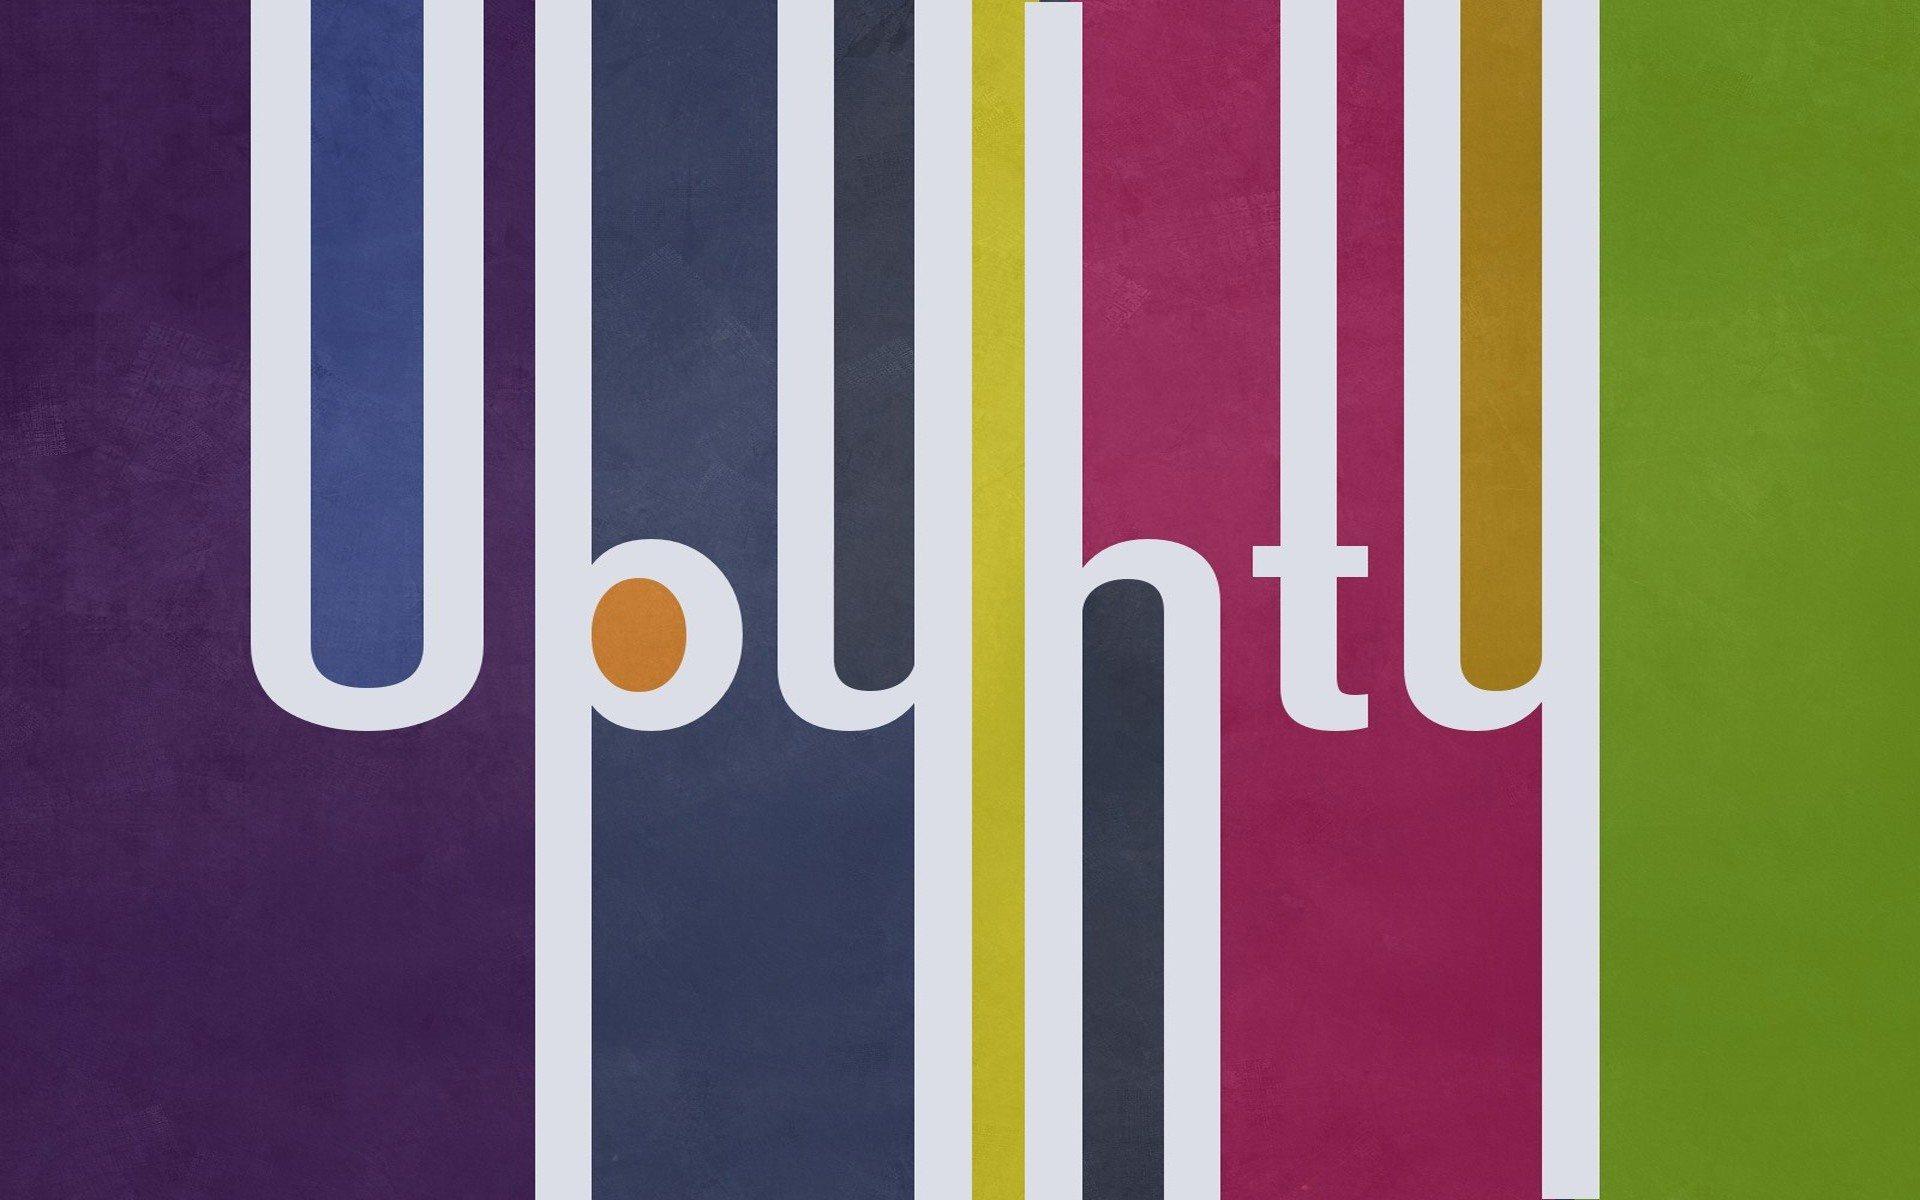 Ubuntu2322810125 - Ubuntu - Ubuntu, 2012